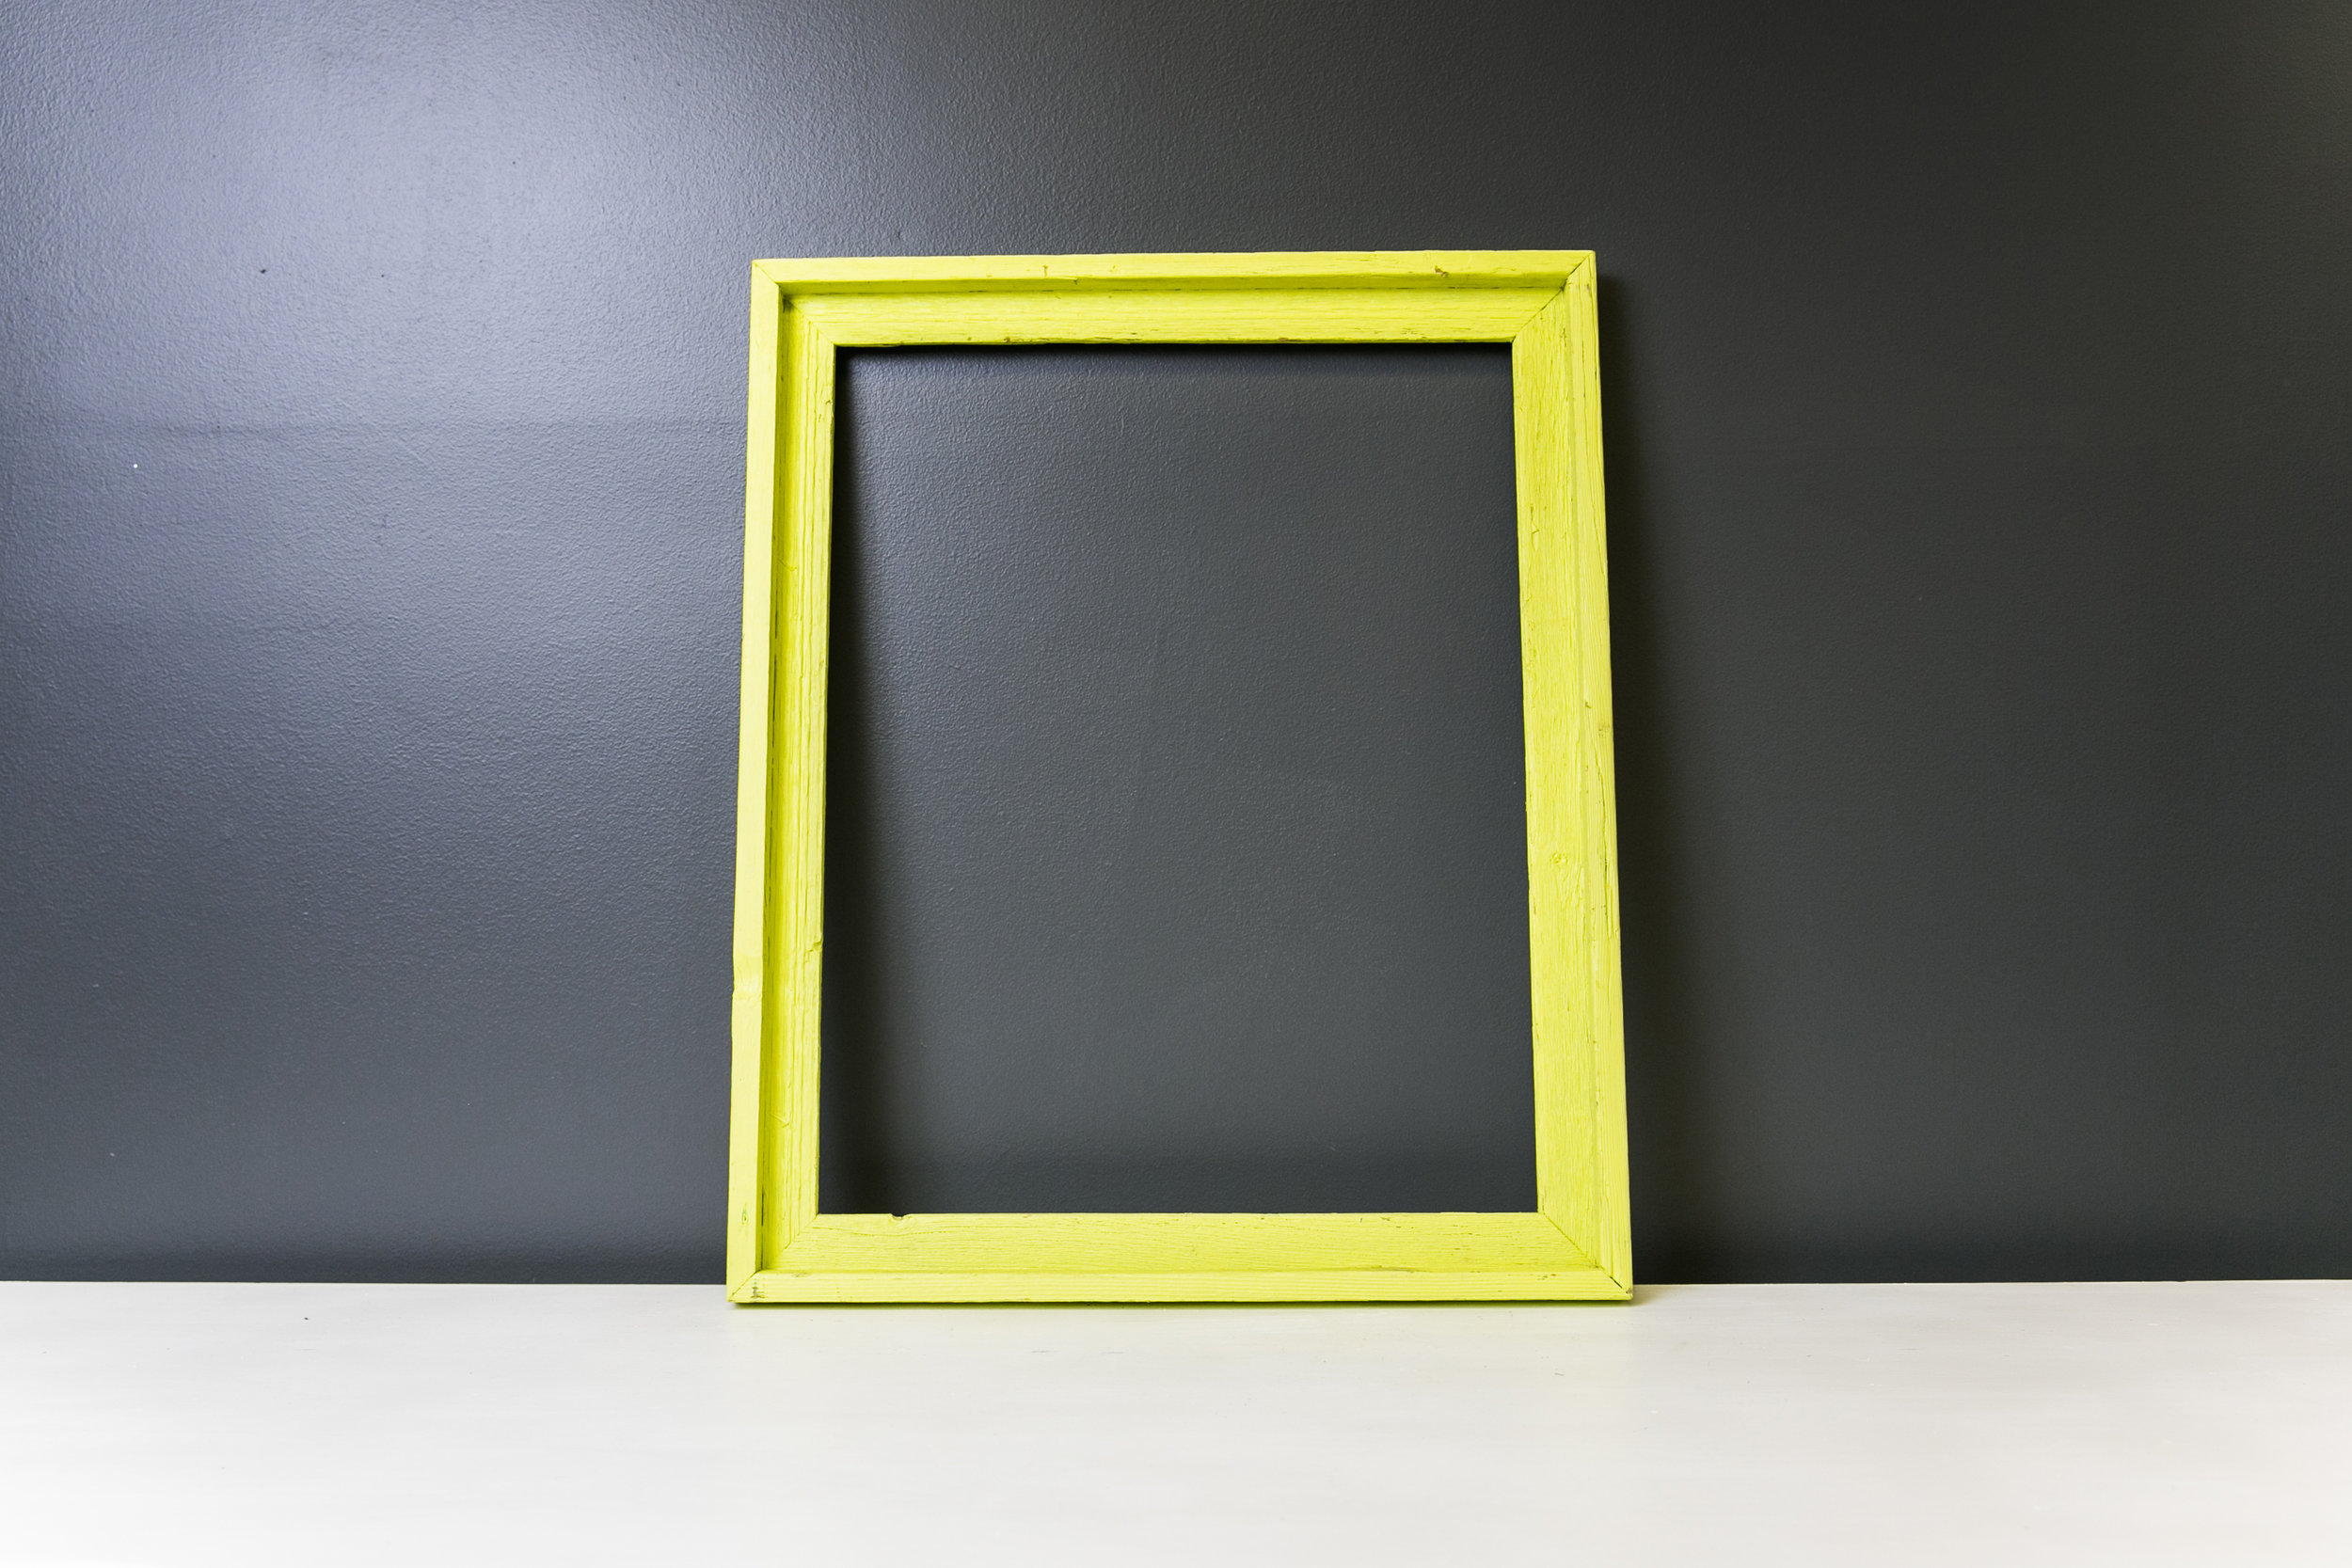 Arlington Rustic Kermit Frame 19 x 22